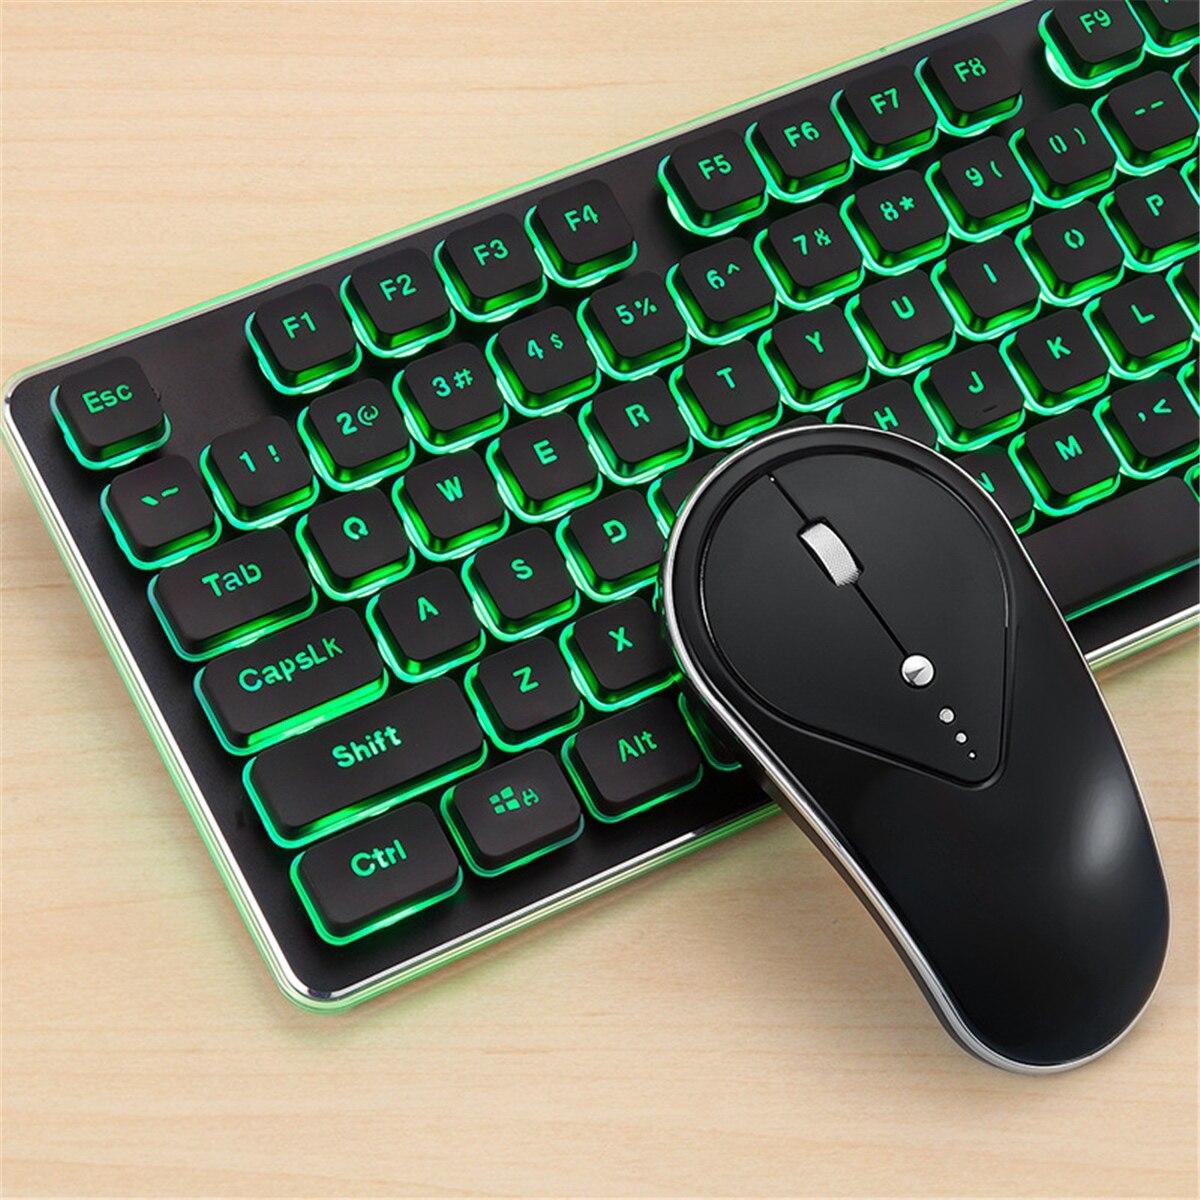 2.4G Wireless Backlit Silent Keyboard And Mouse Combo For PS4 Home Office Laptop Desktop Ergonomic Waterproof Wireless Keyboard